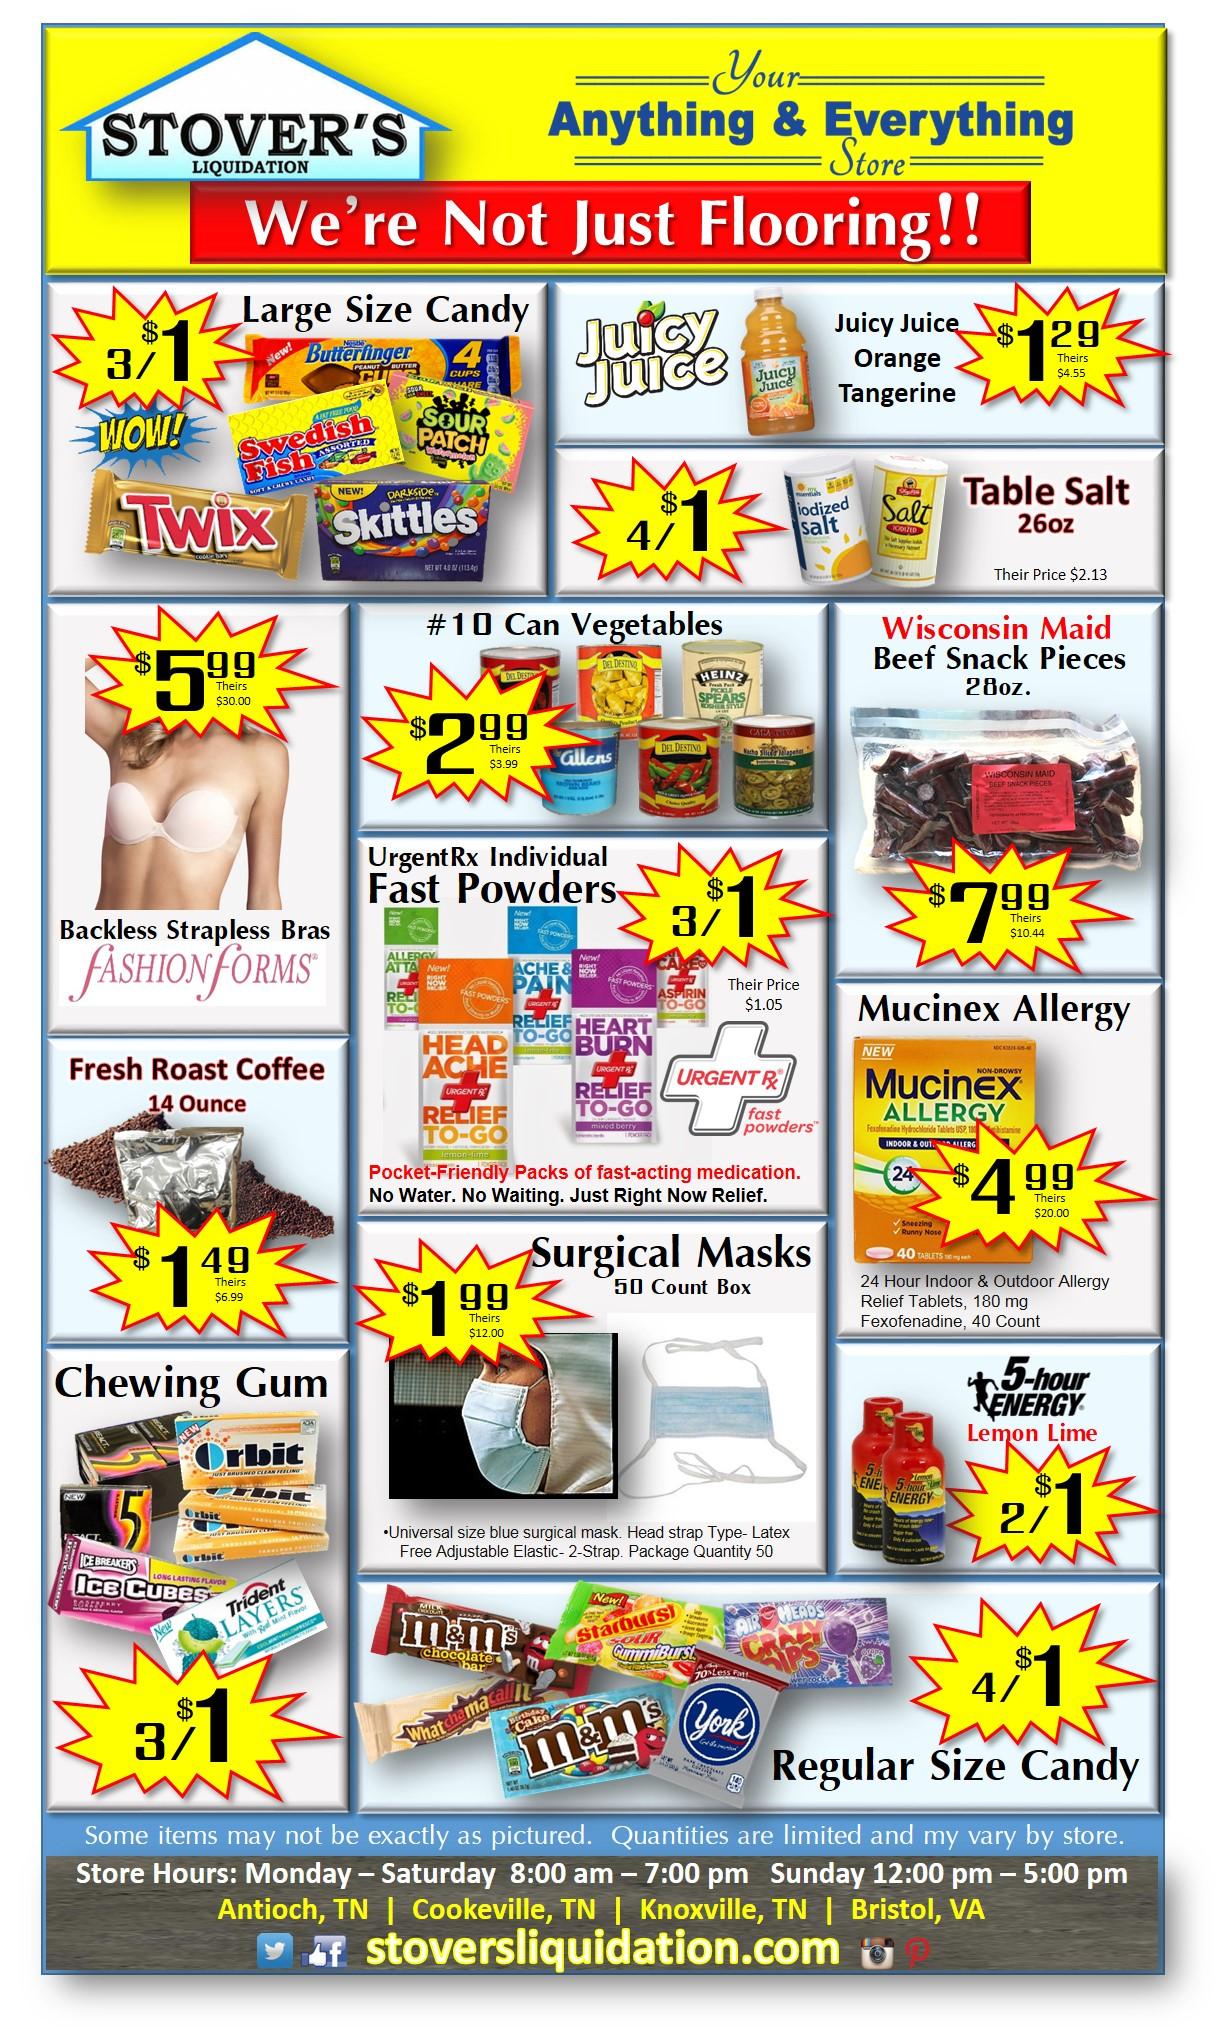 sales-ad-page-1-1-.jpg